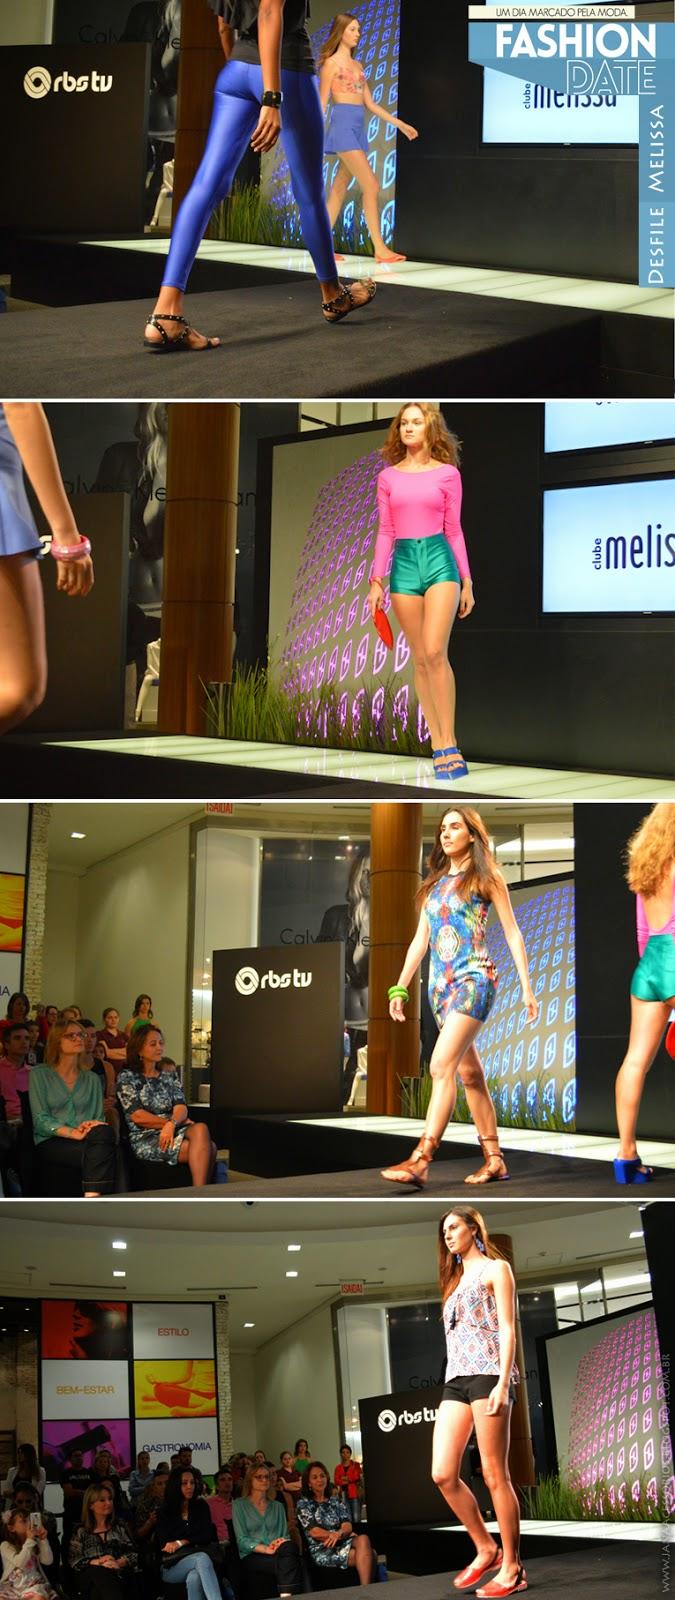 Joinville, moda, fashio, schutz, aramis, melissa, bobstore, blogueira, blogger, Fashion Date